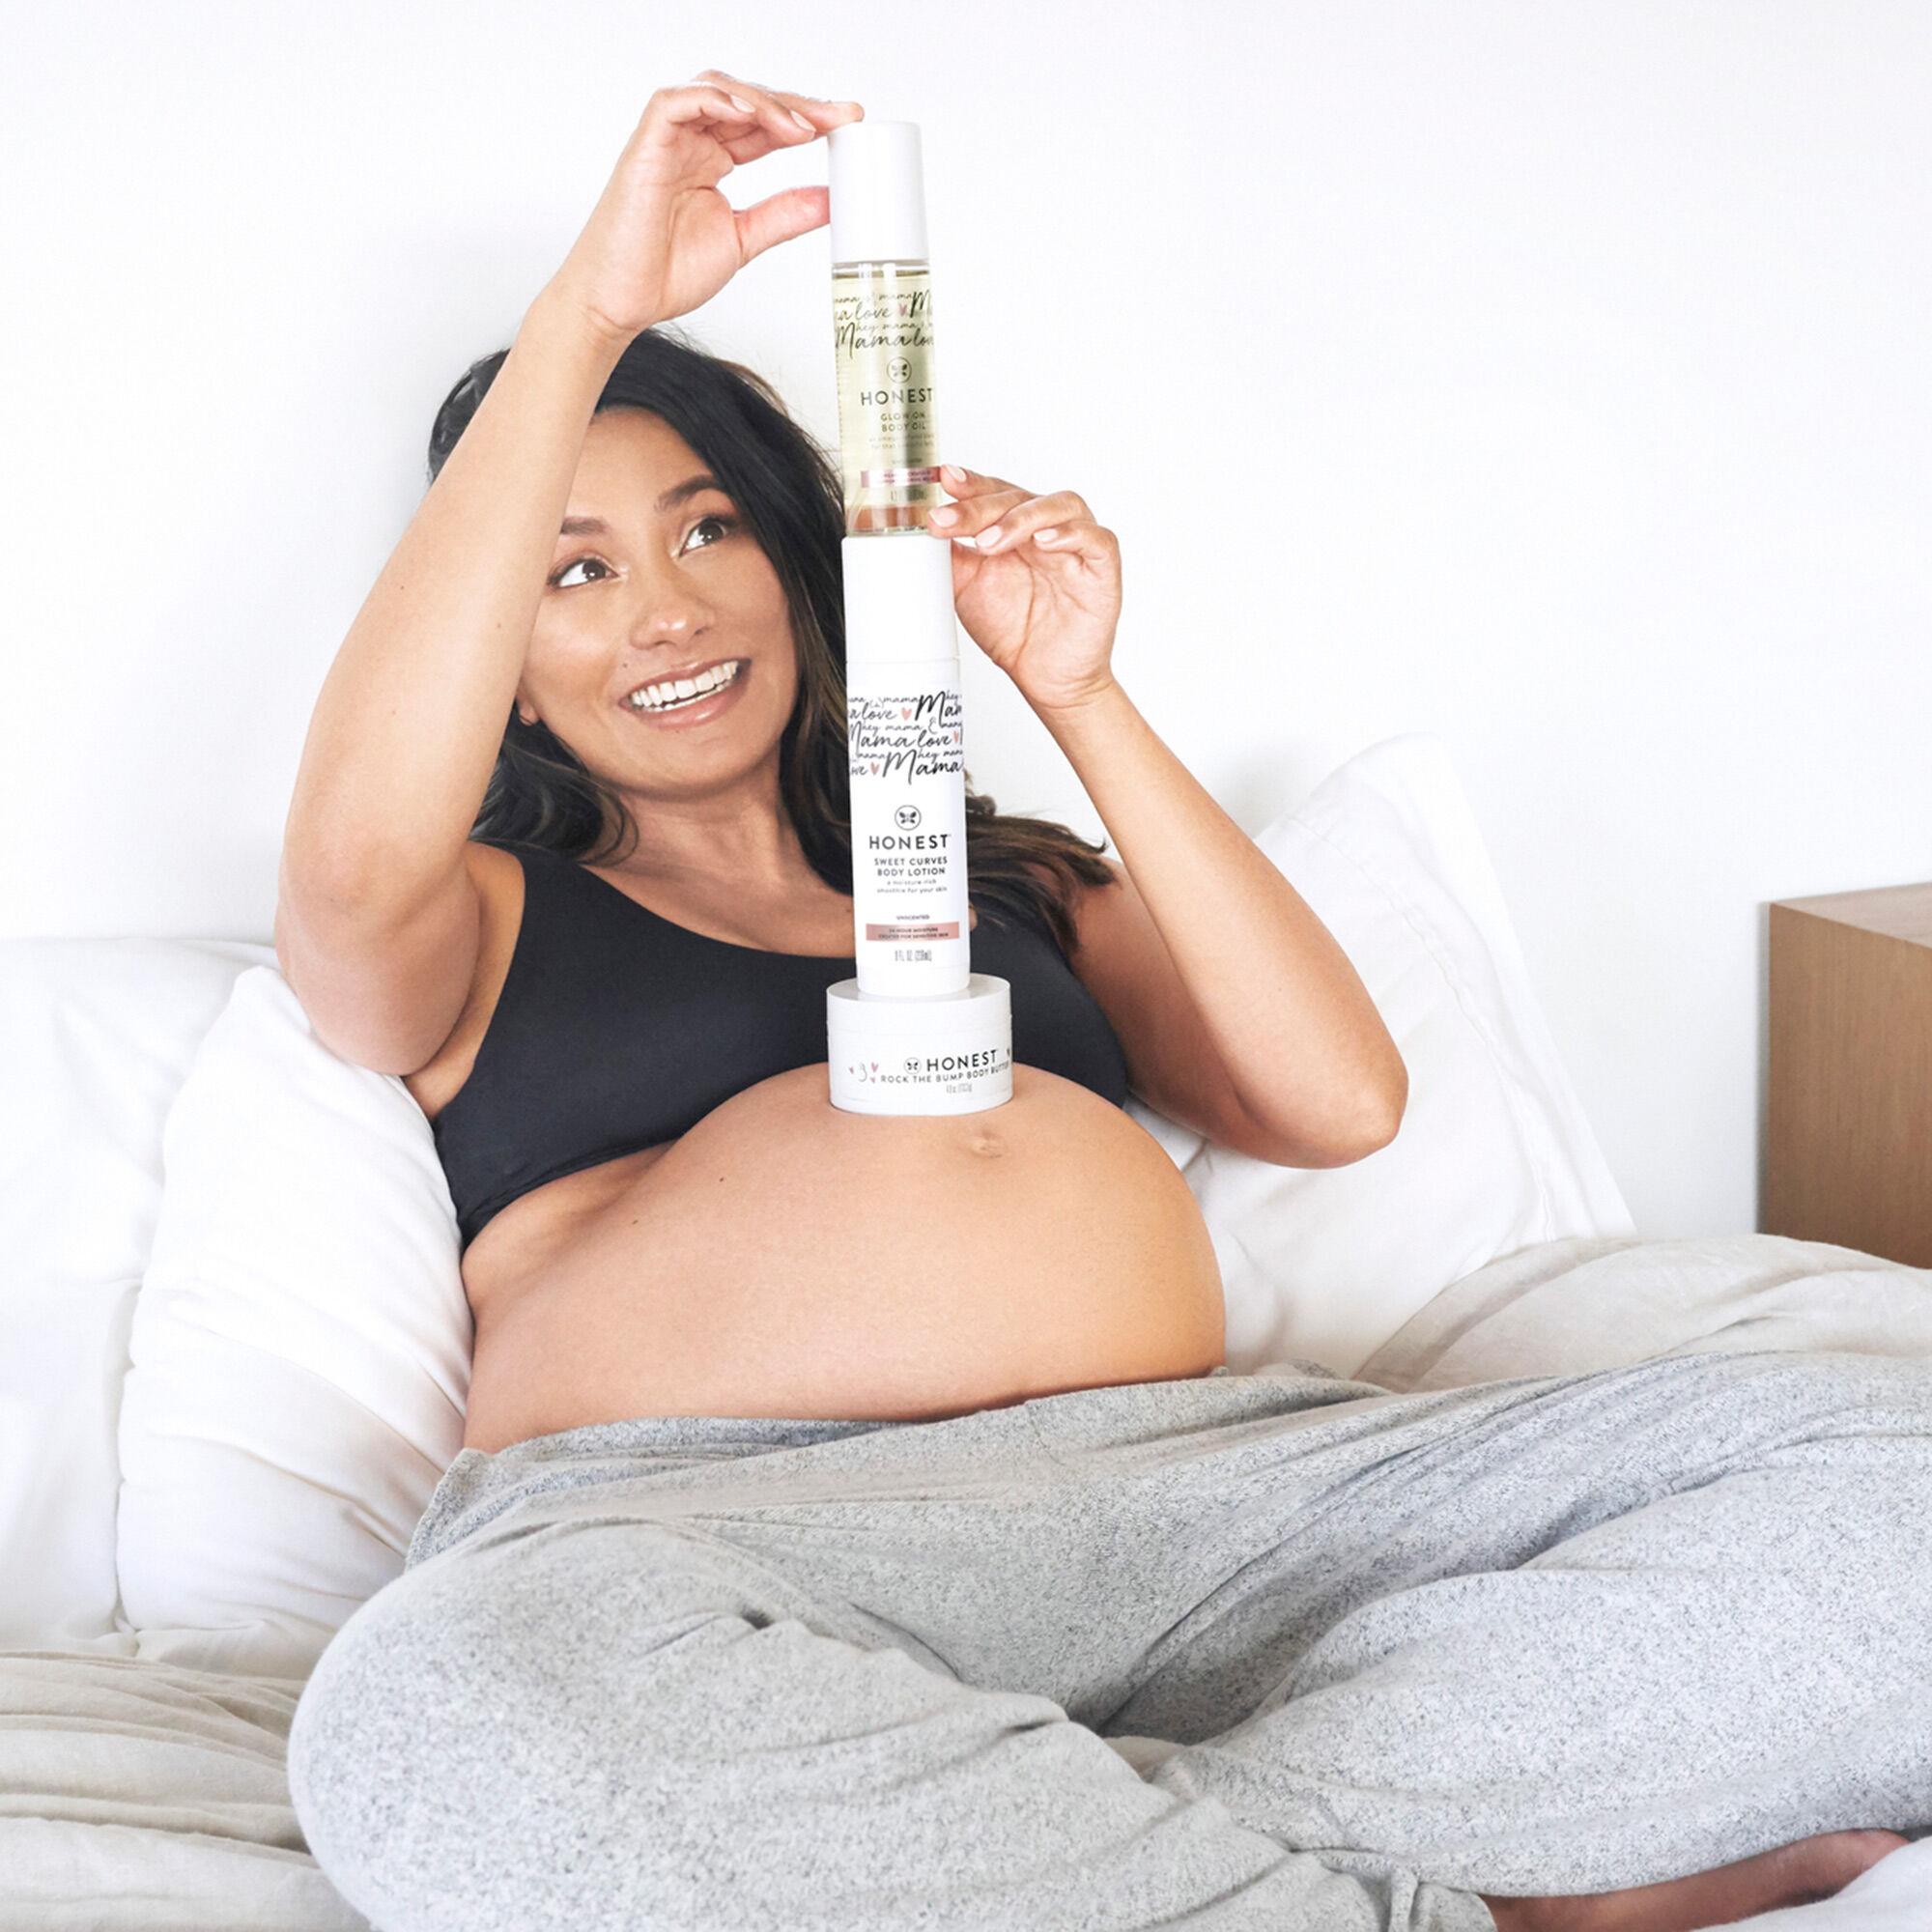 Honest Mama Bump Care Kit